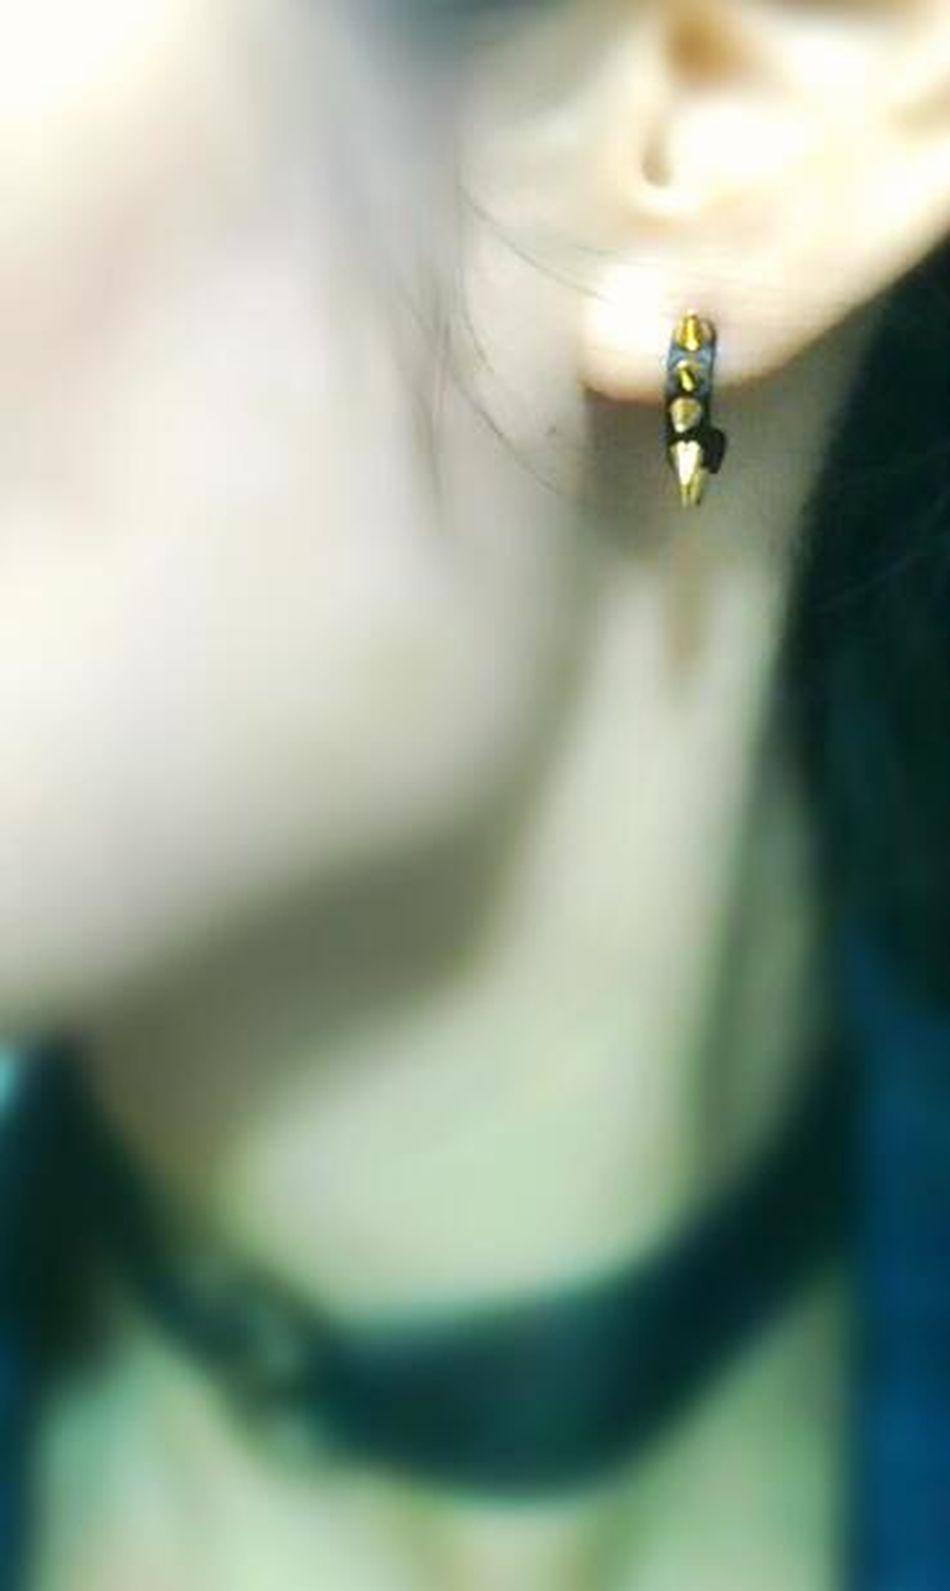 Newarrival Earrings Necklace Michaellashin 어제 블락비 일본가기전 완성됐었음 좋았을걸...